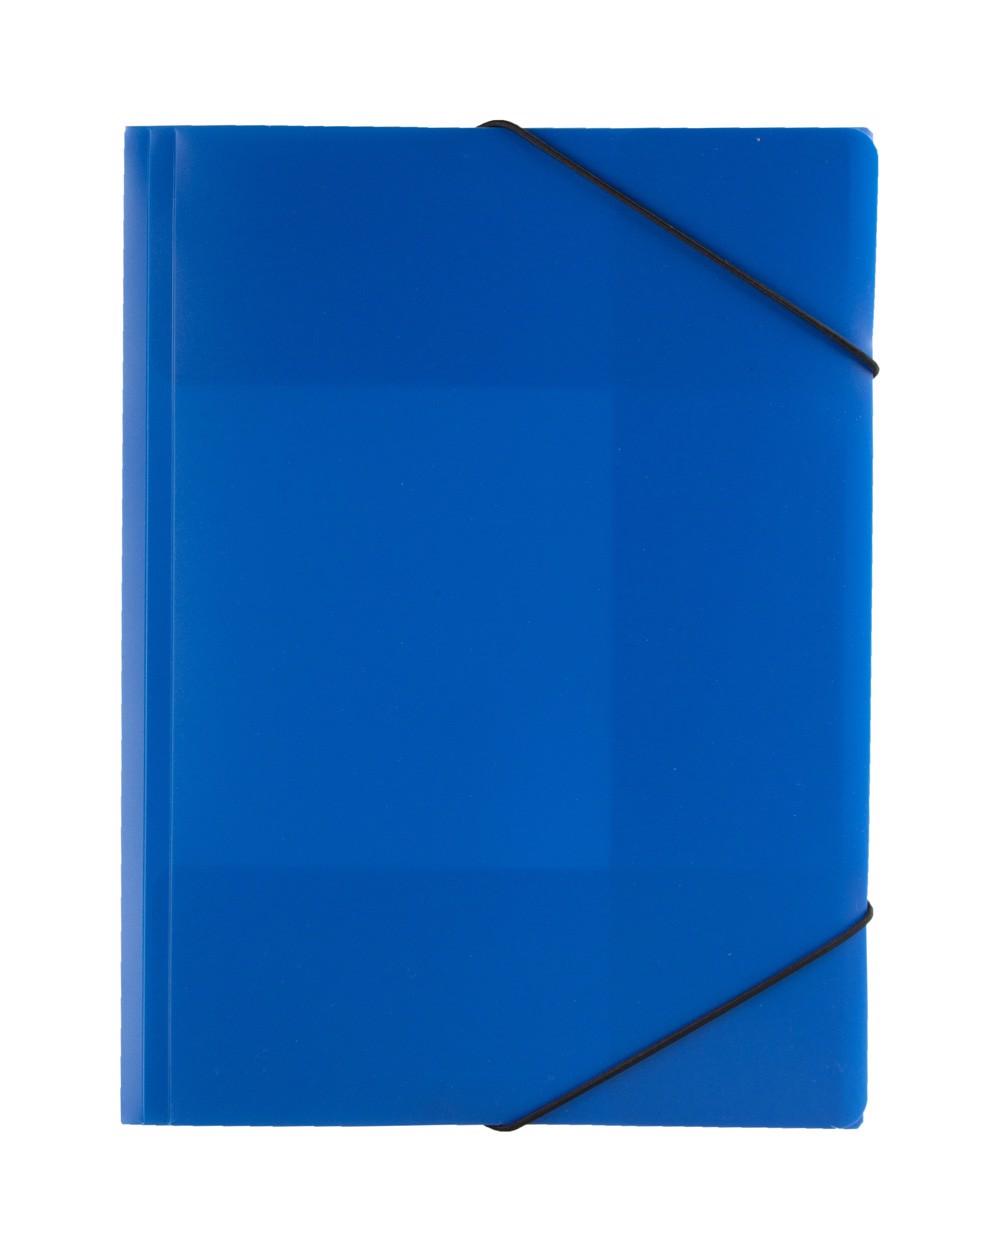 Pp Sloha Na Dokumenty Alpin - Modrá